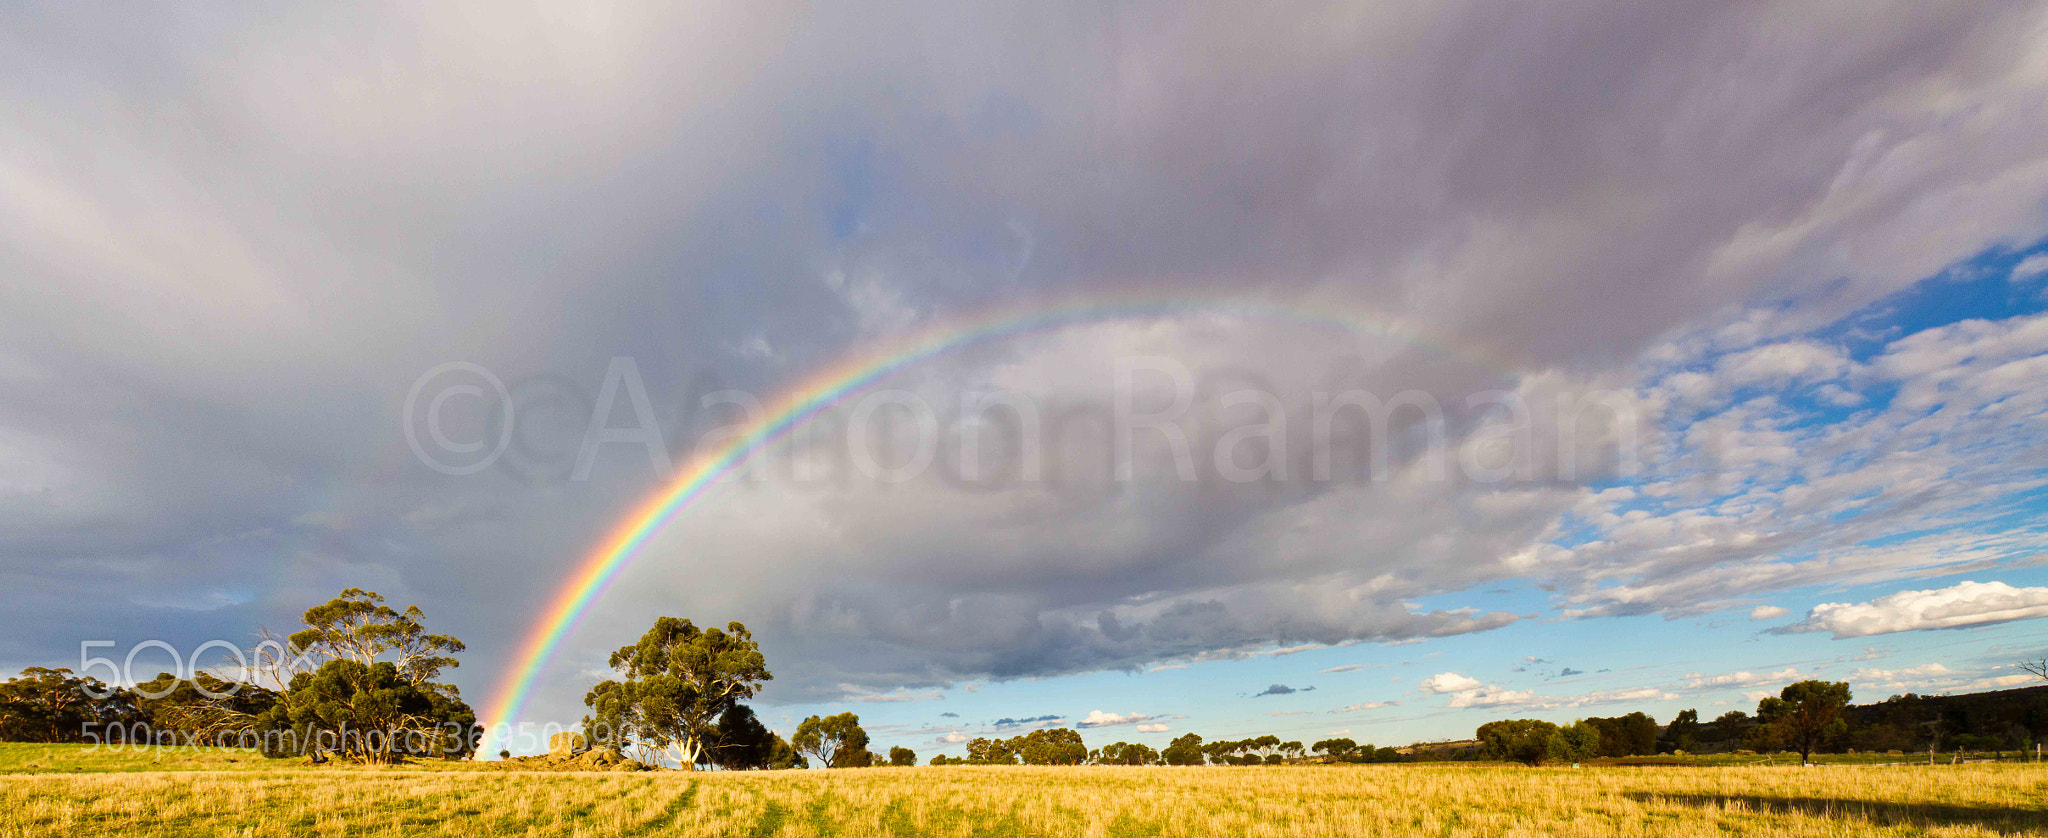 Photograph Amazing Western Australia by Aaron Raman on 500px